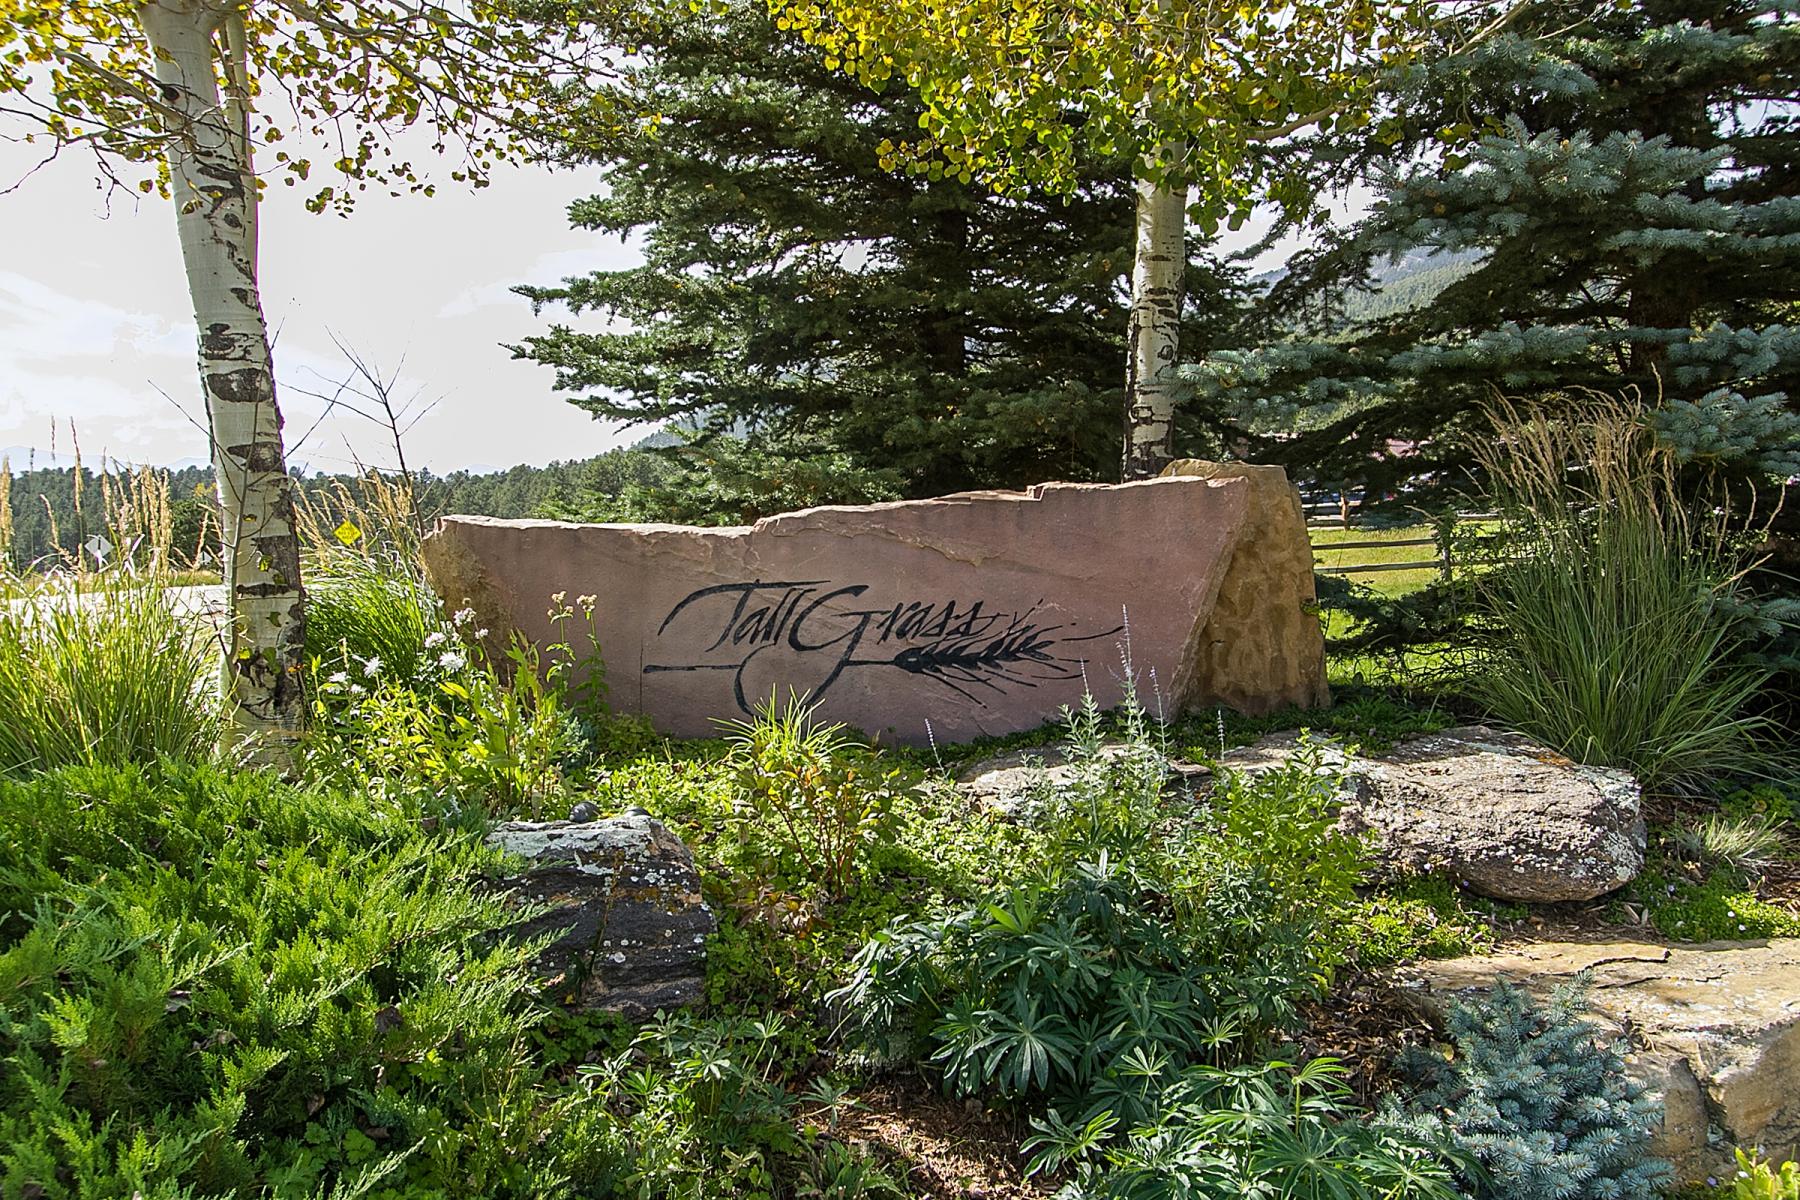 123 Fox Ridge Drive 123 Fox Ridge Drive Evergreen, Colorado 80439 United States